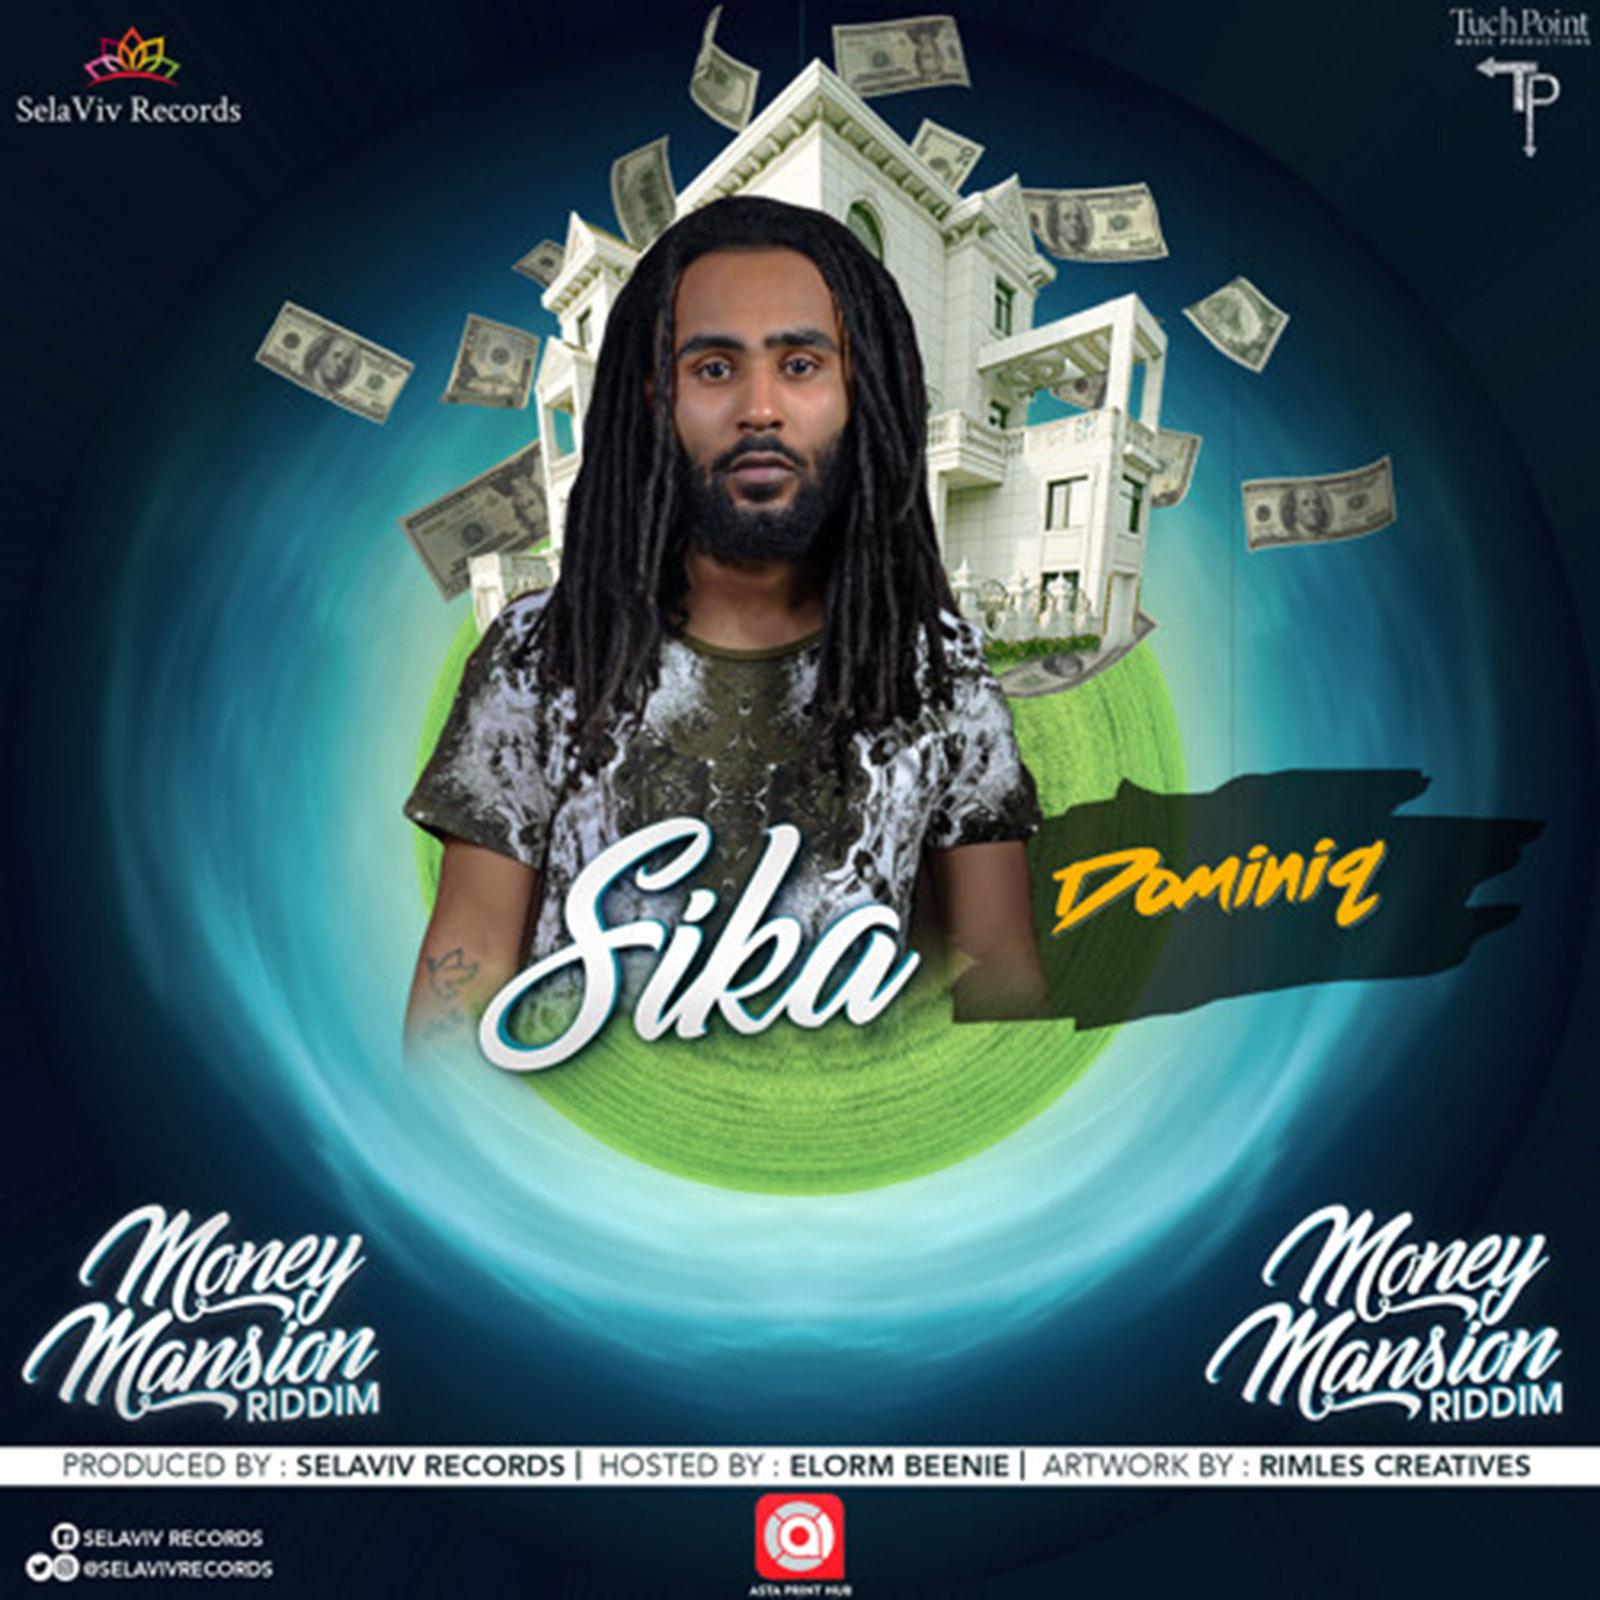 Sika (Money Mansion Riddim) by Dominiq